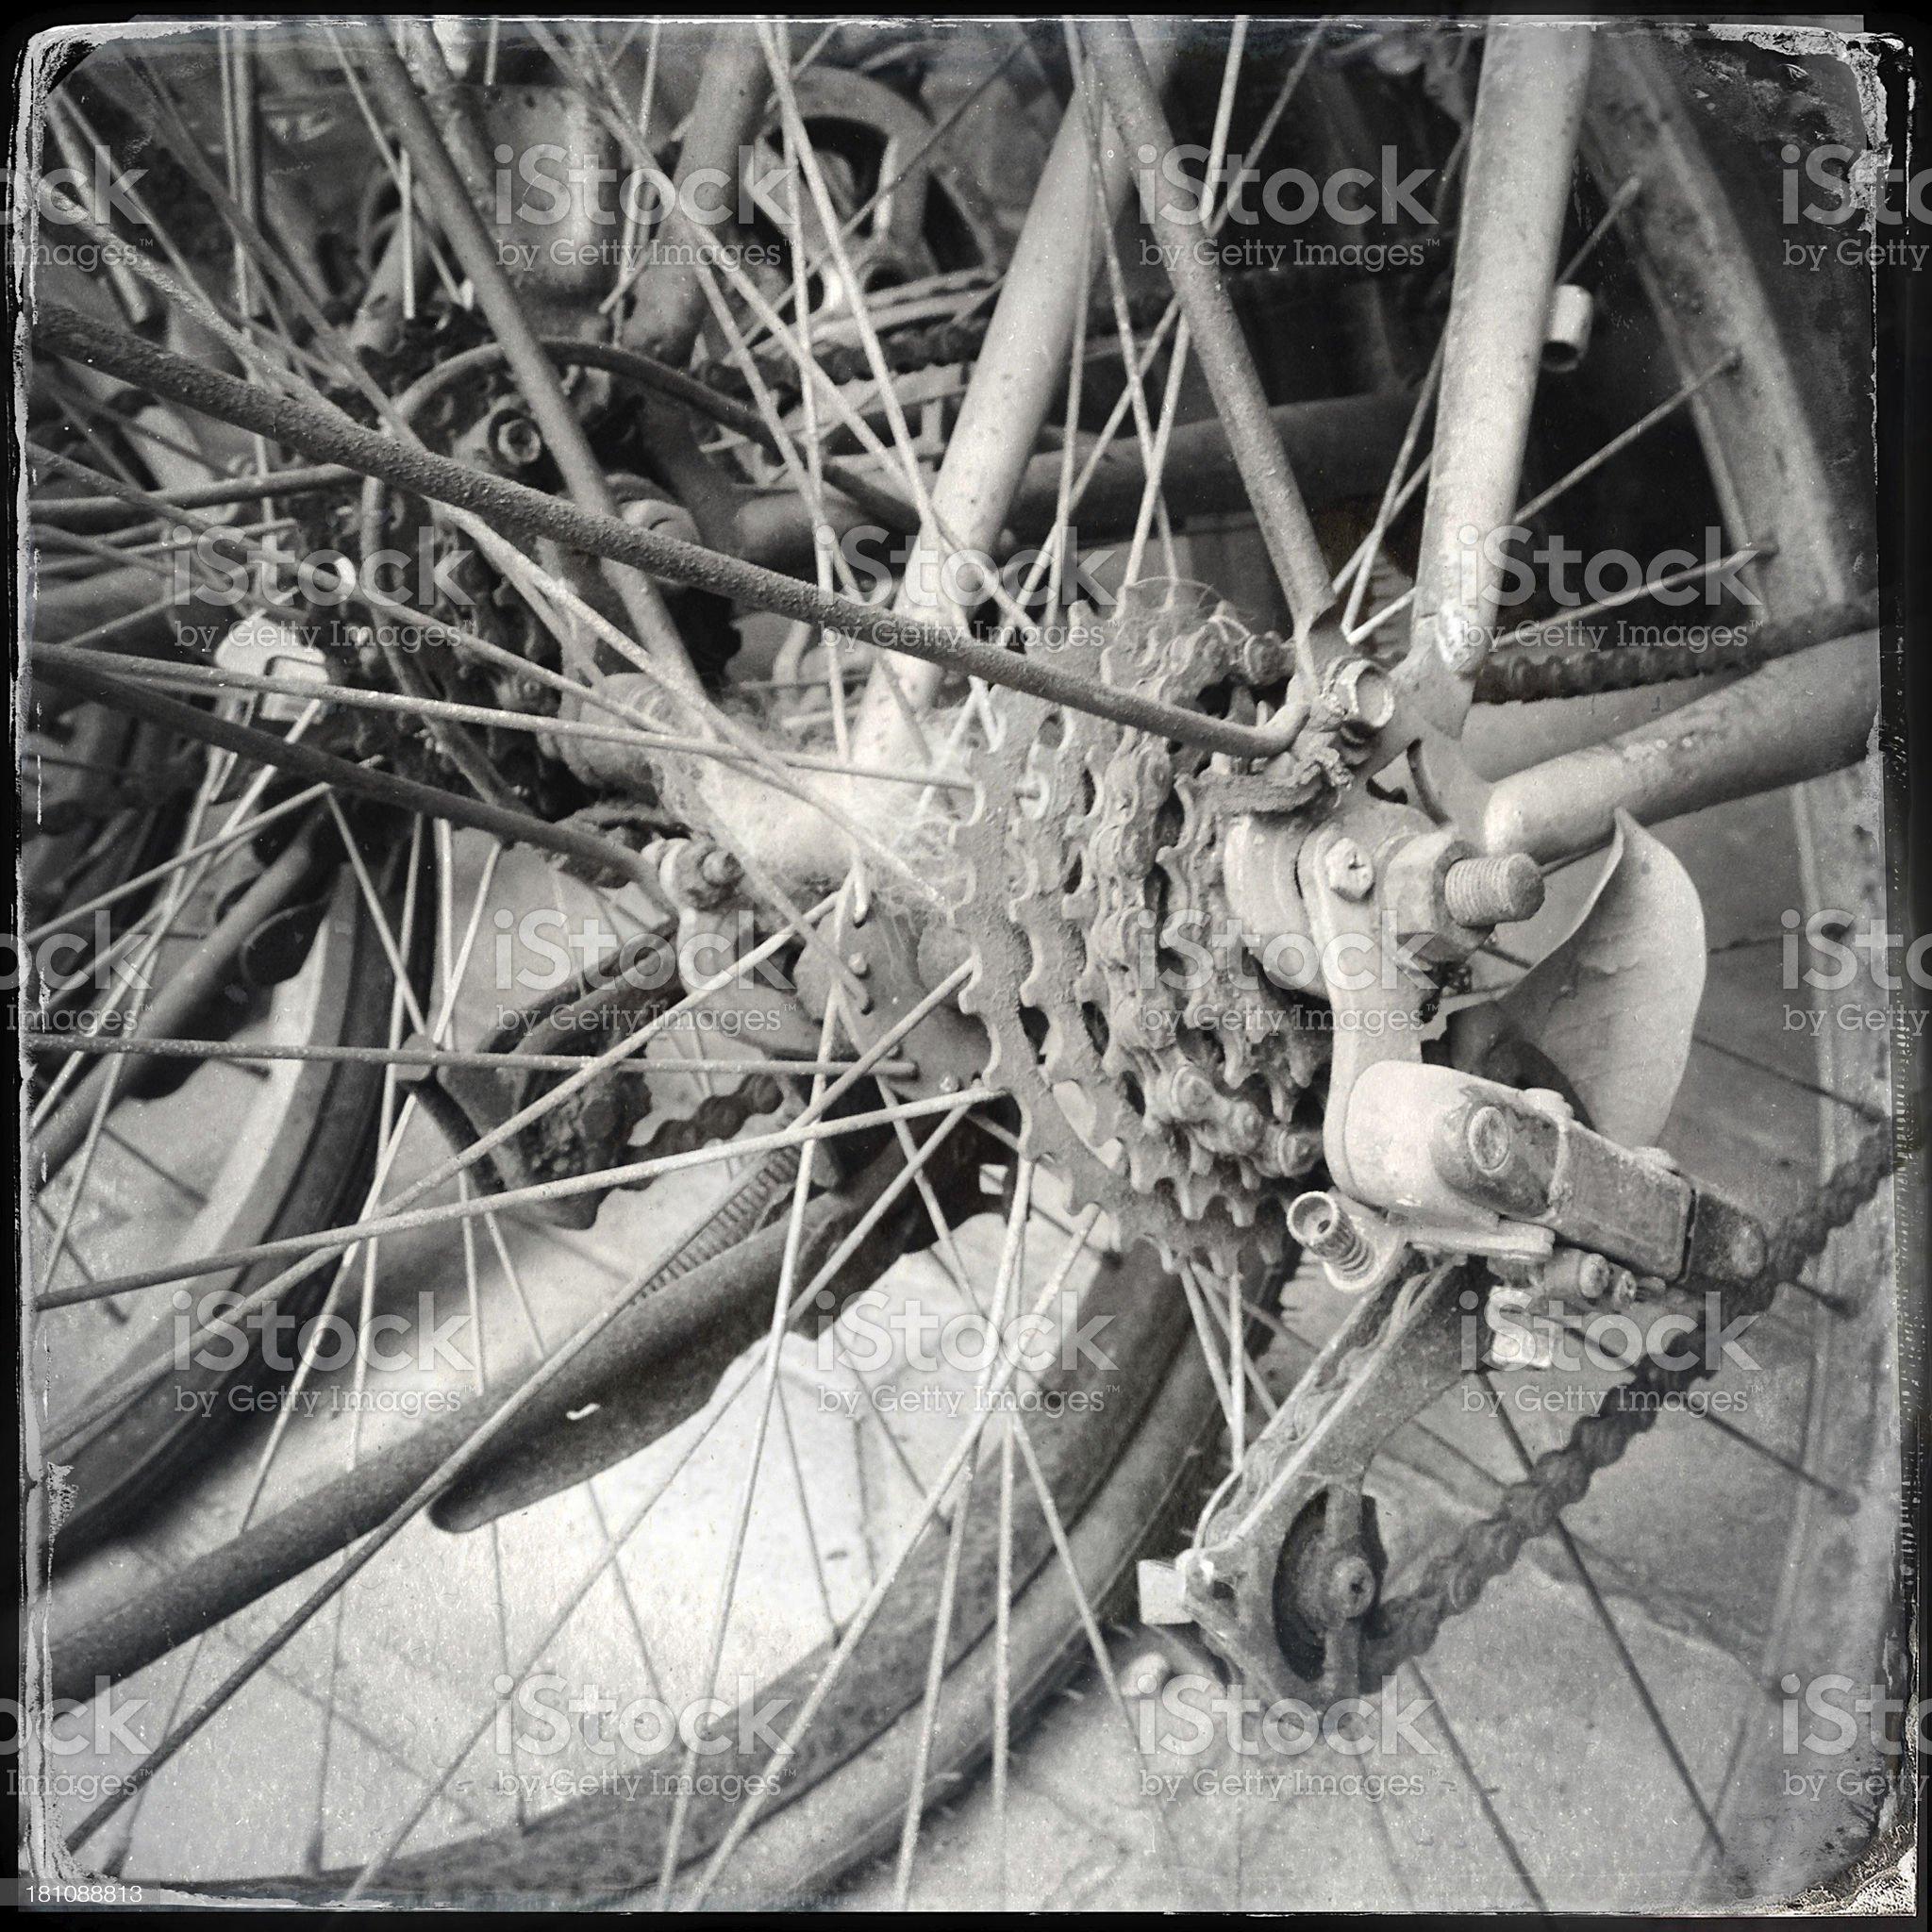 Scrap bike royalty-free stock photo